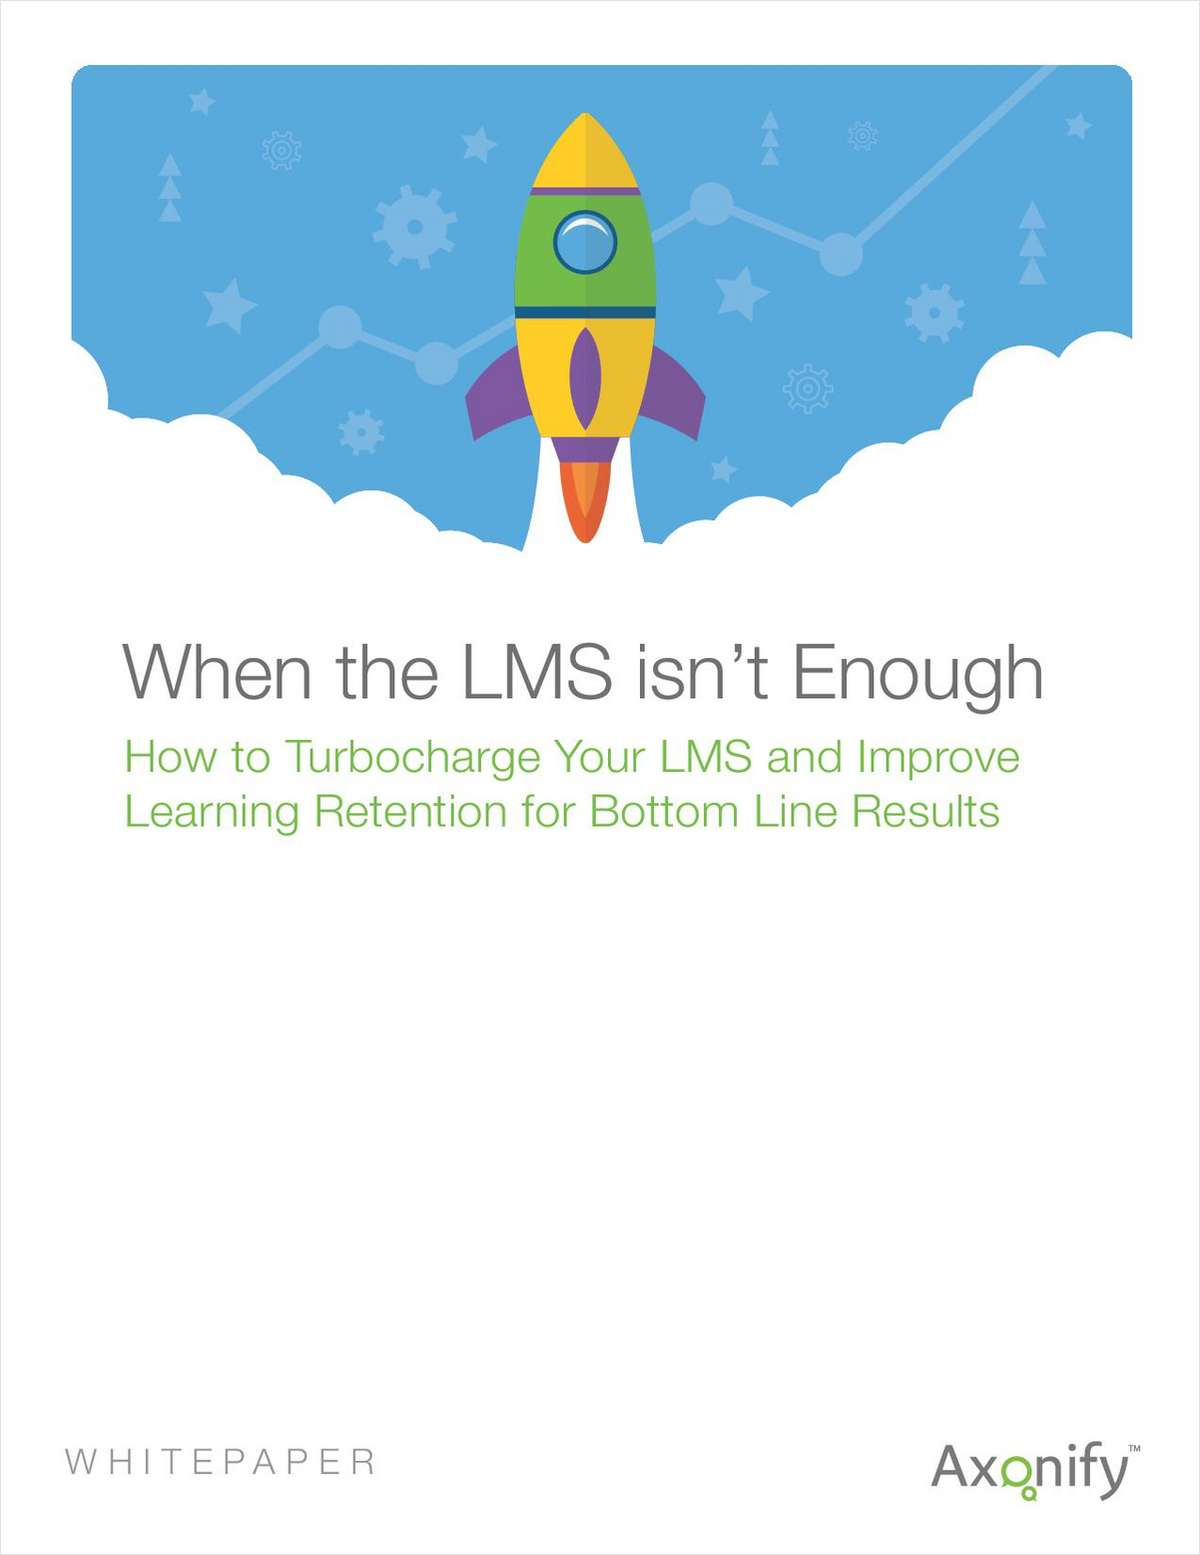 When the LMS Isn't Enough